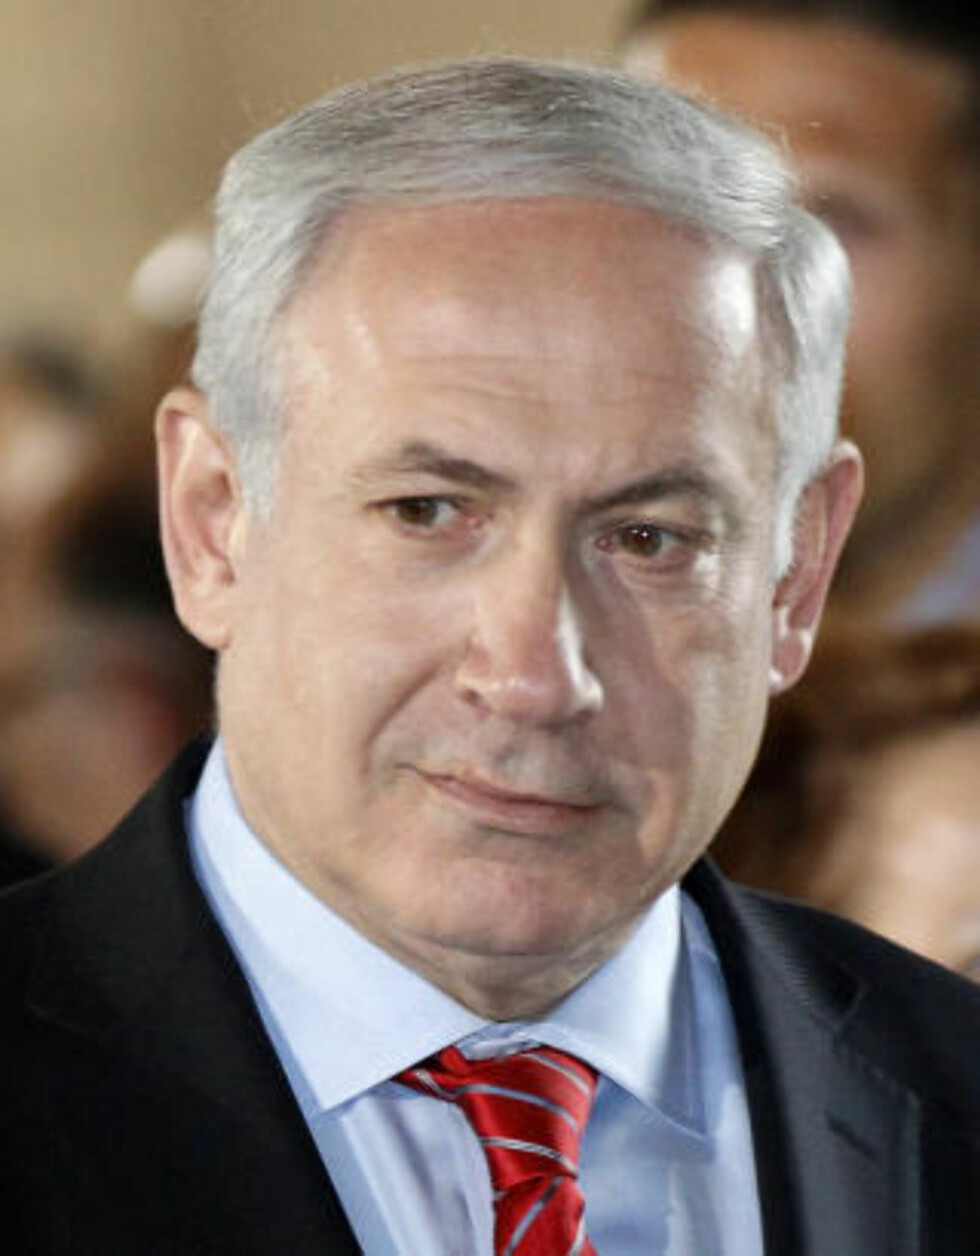 AVLYSER: Benjamin Netanyahu avlyser samtaler med Obama. Foto: REUTERS/Chris Wattie/SCANPIX